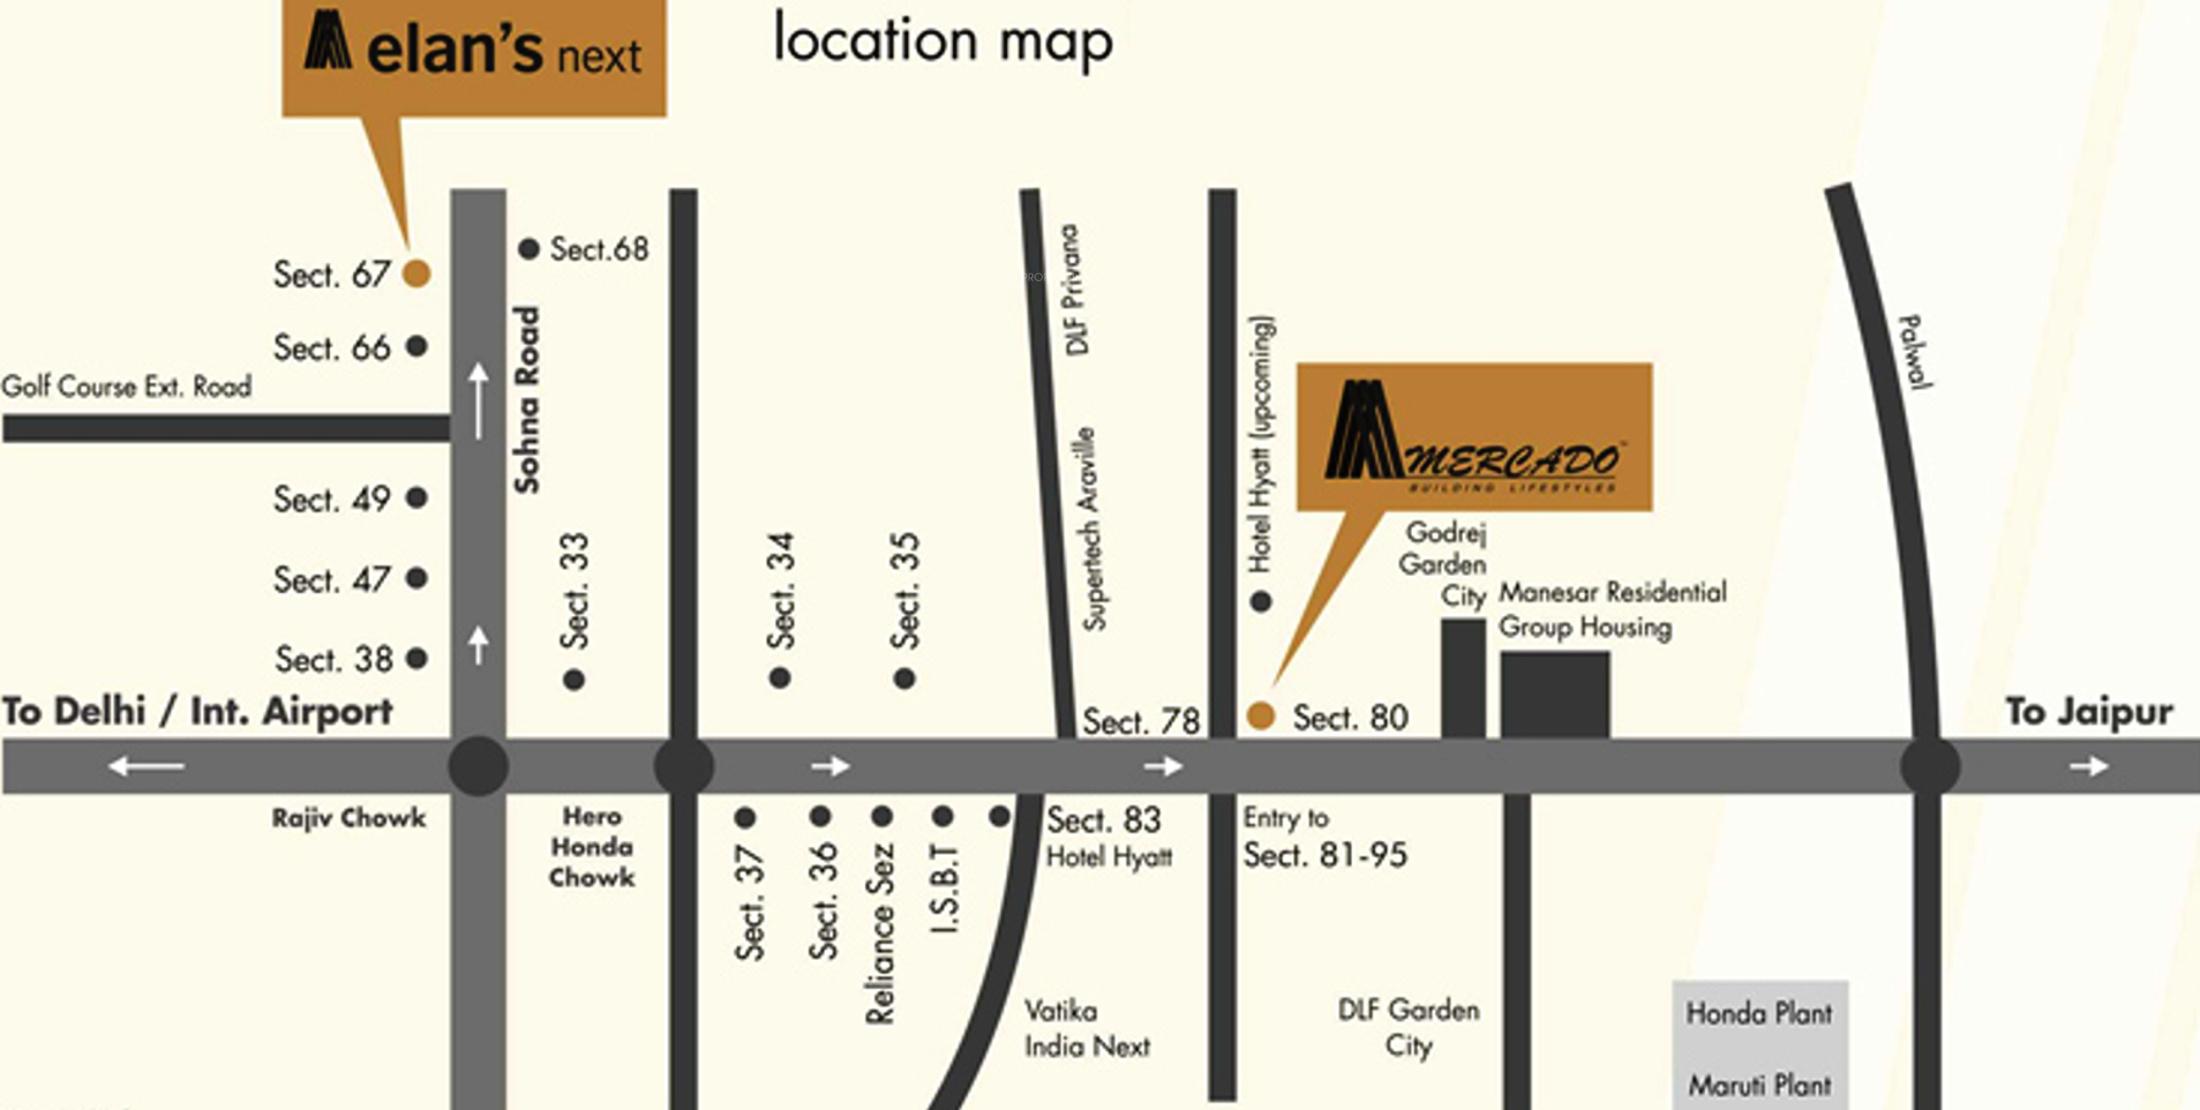 Elan Next In Sector 67 Gurgaon Price Location Map